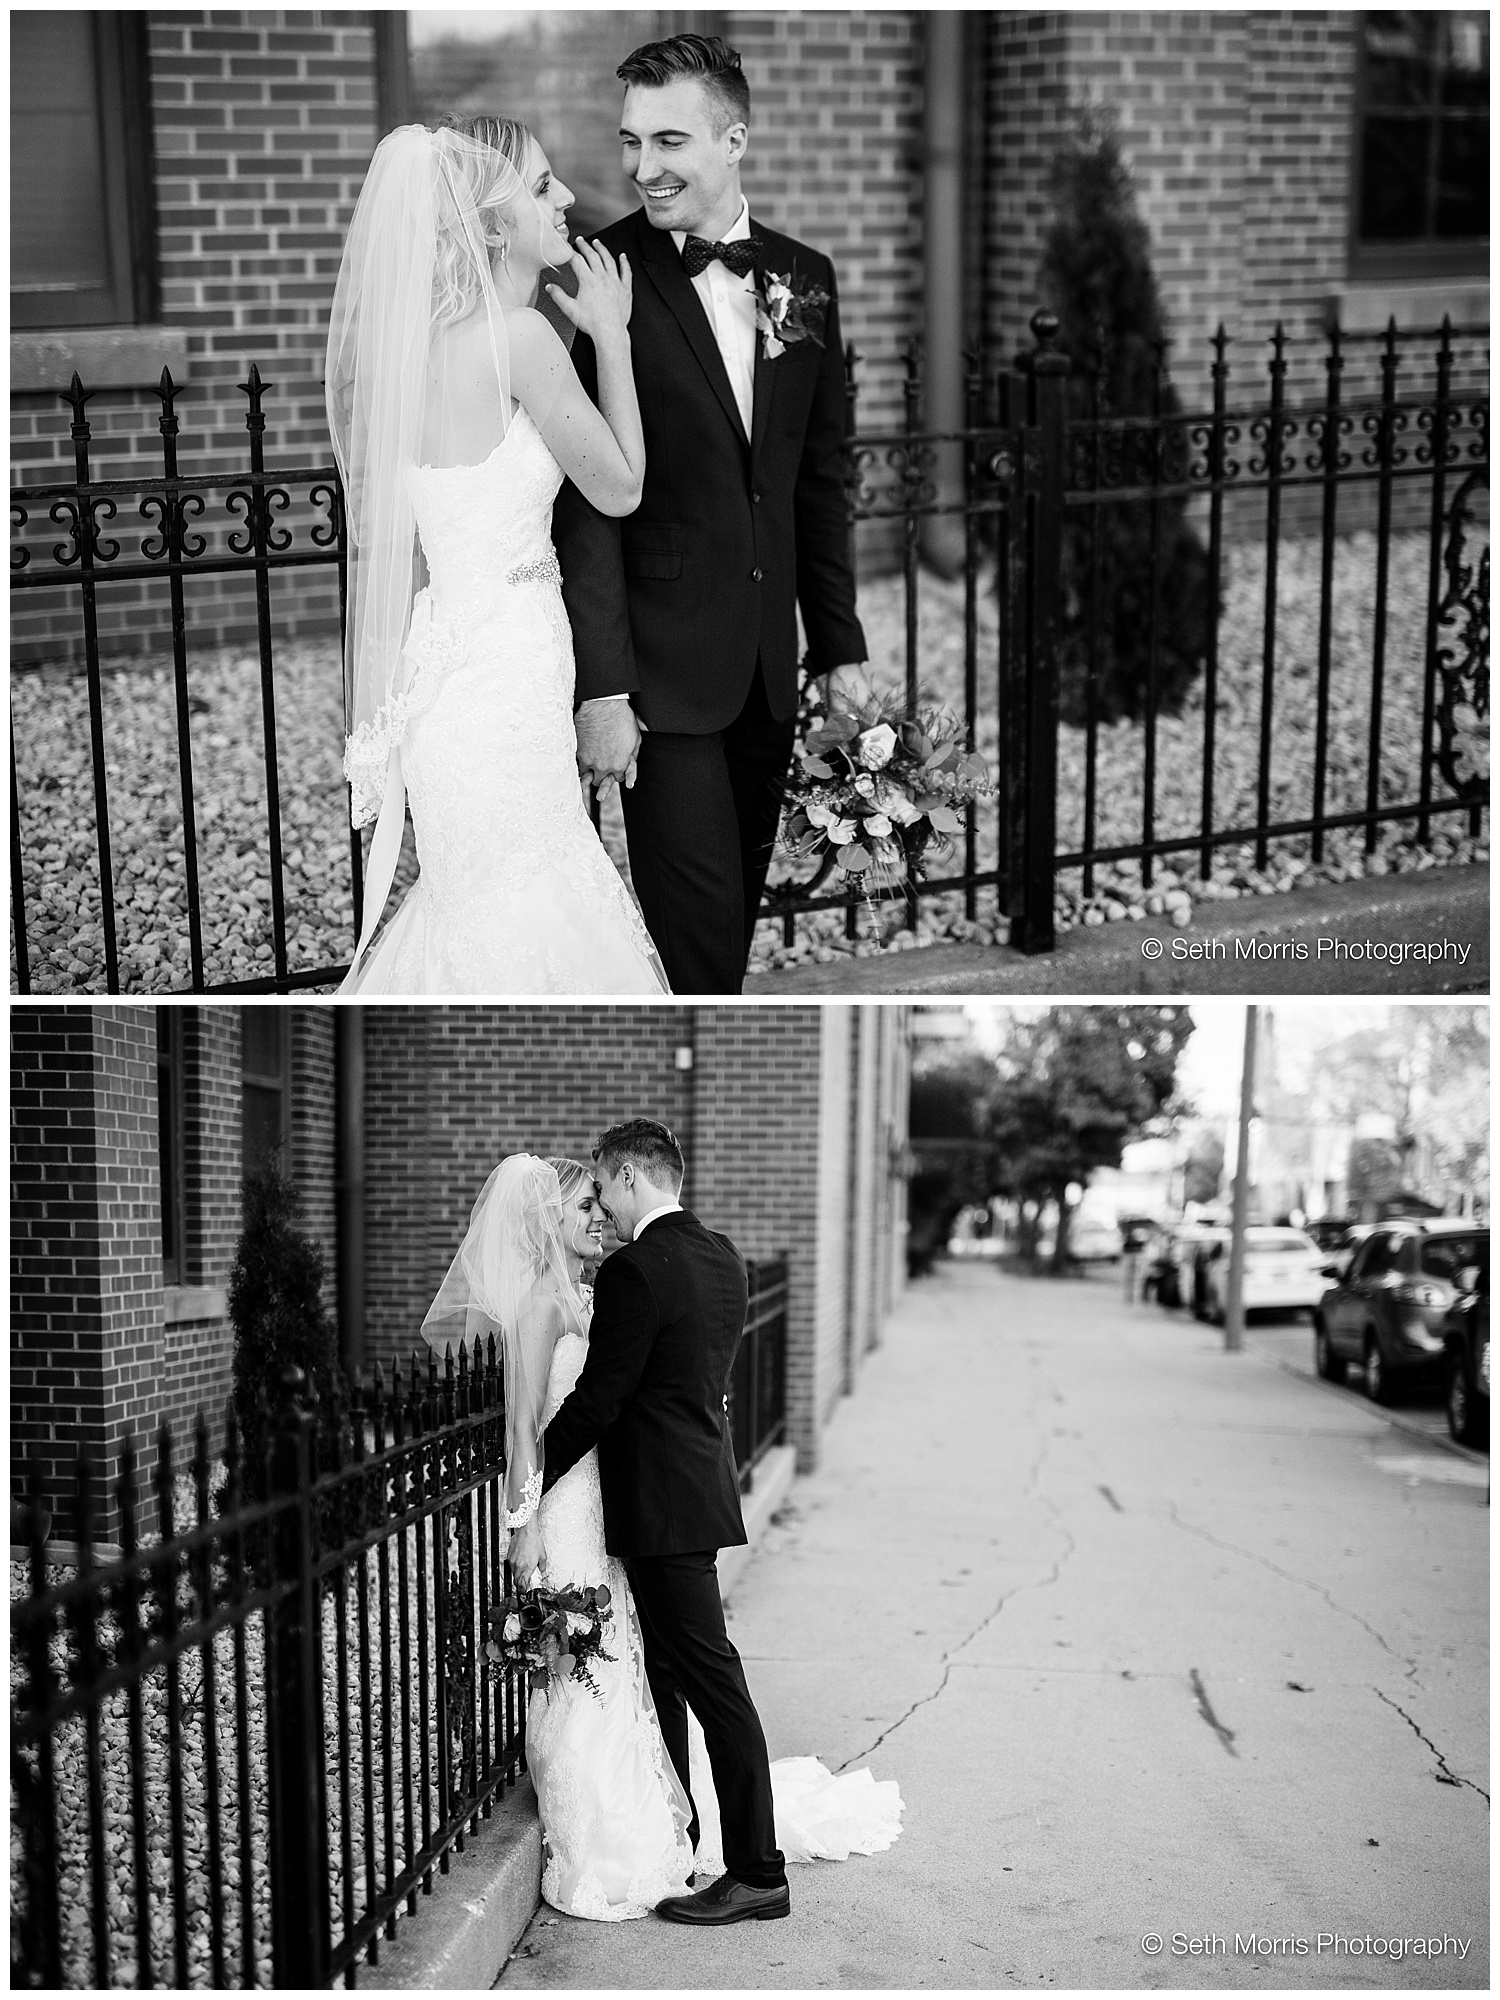 fall-wedding-ottawa-illinois-photographer-81.jpg